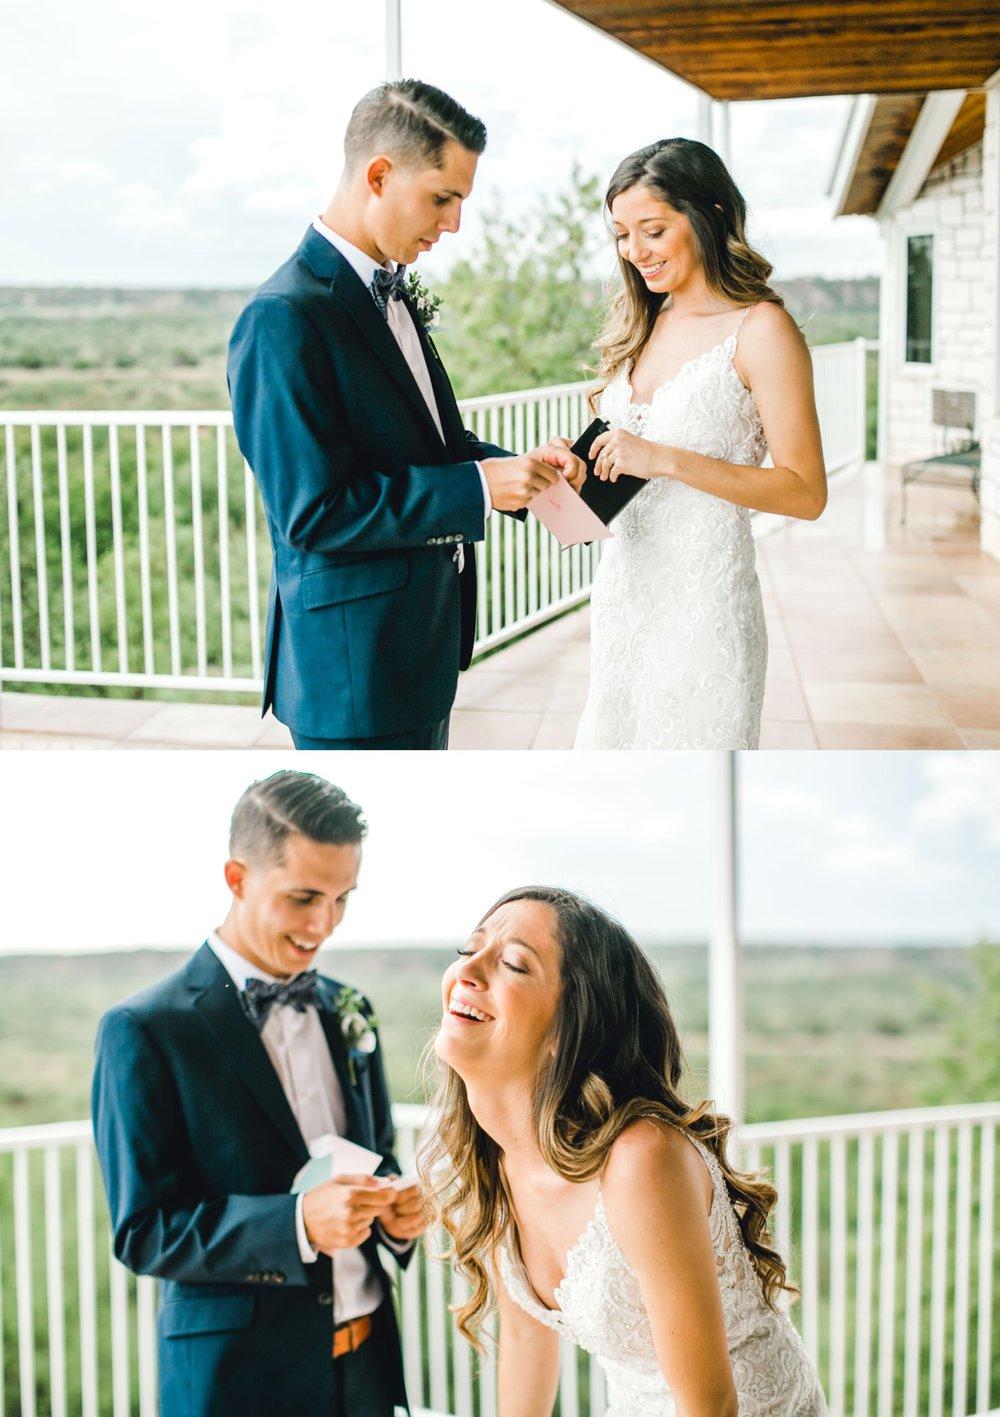 Ashley_John_English_Elegant_Texas_Wedding_Outdoors_Ranch_Caprock_Winery_ALLEEJ_0031.jpg